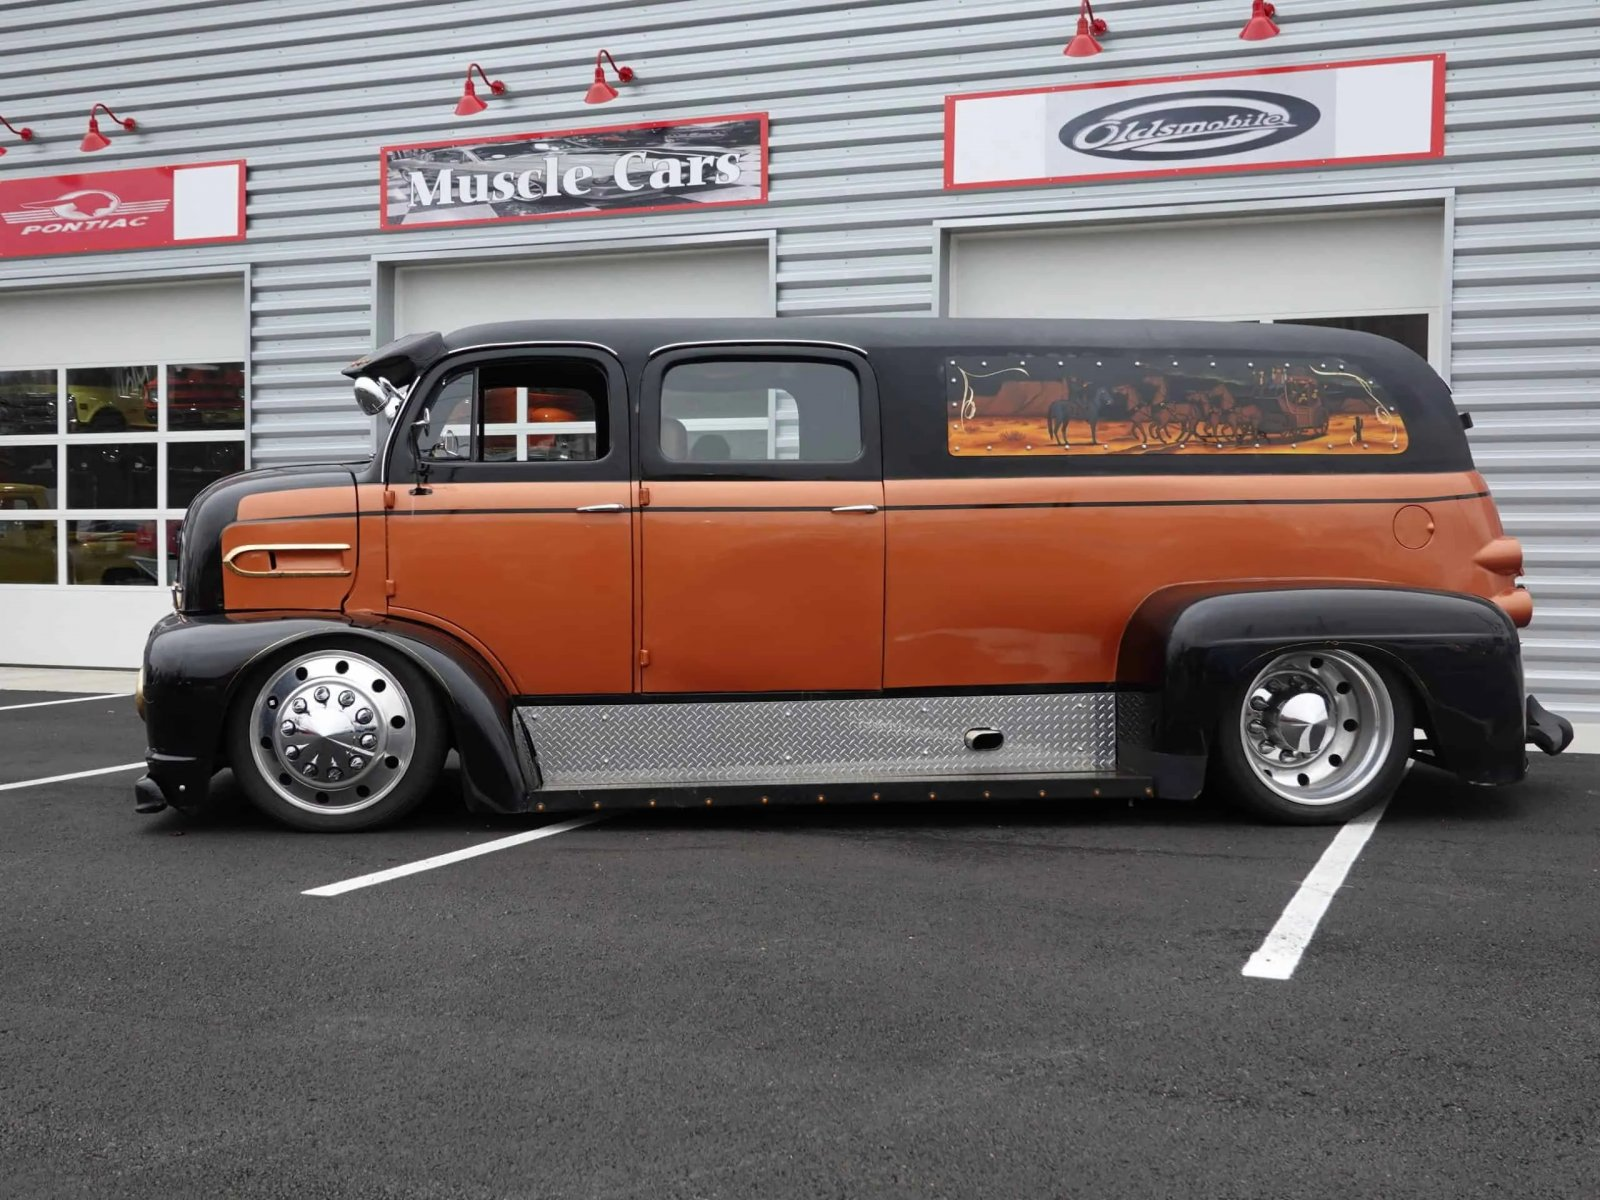 1951 Ford COE Custom - For Sale 3.jpg